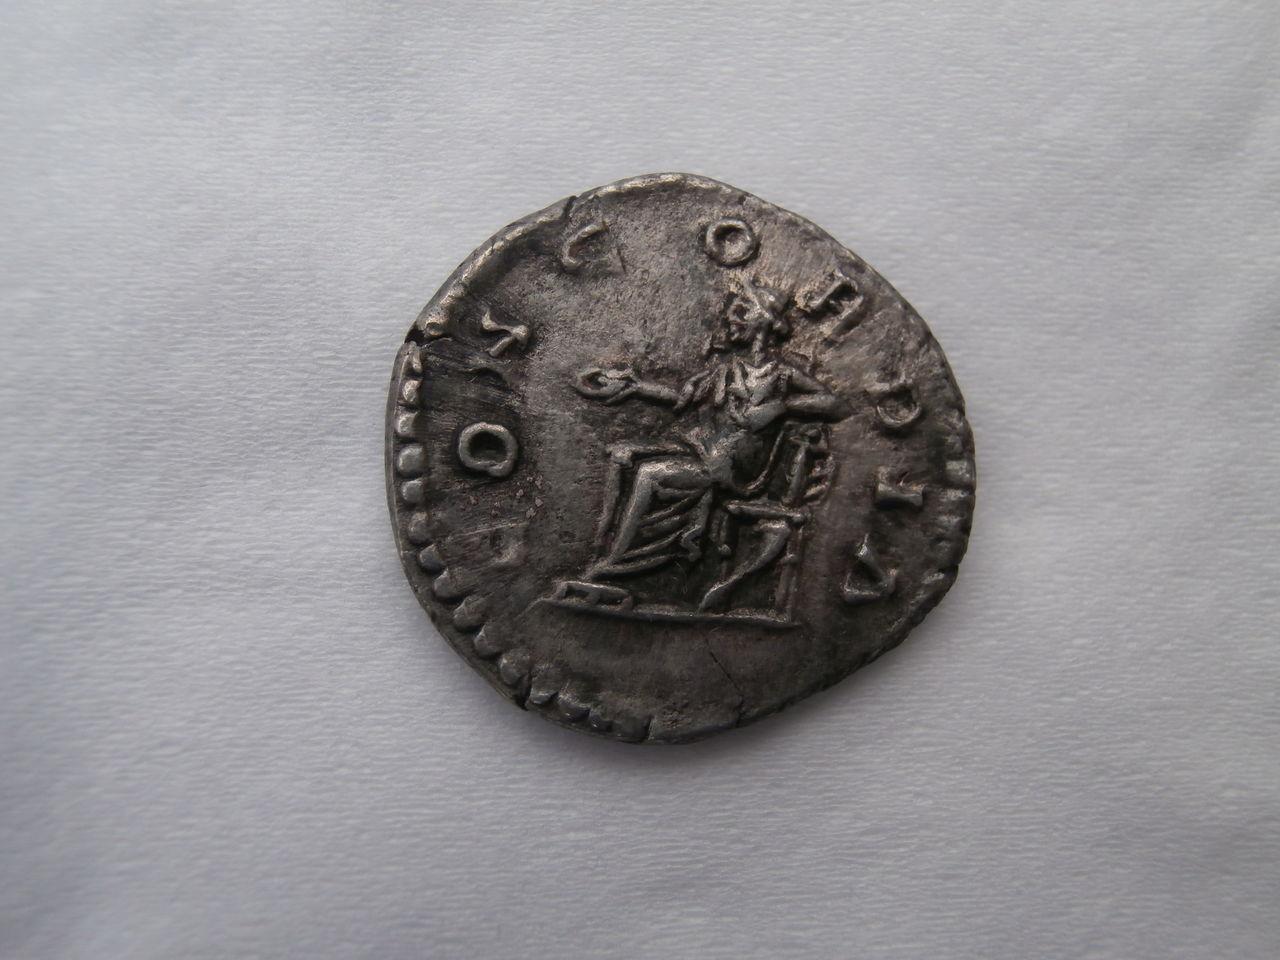 Denario de Lucila. CONCORDIA. Ceca Roma. P4170331